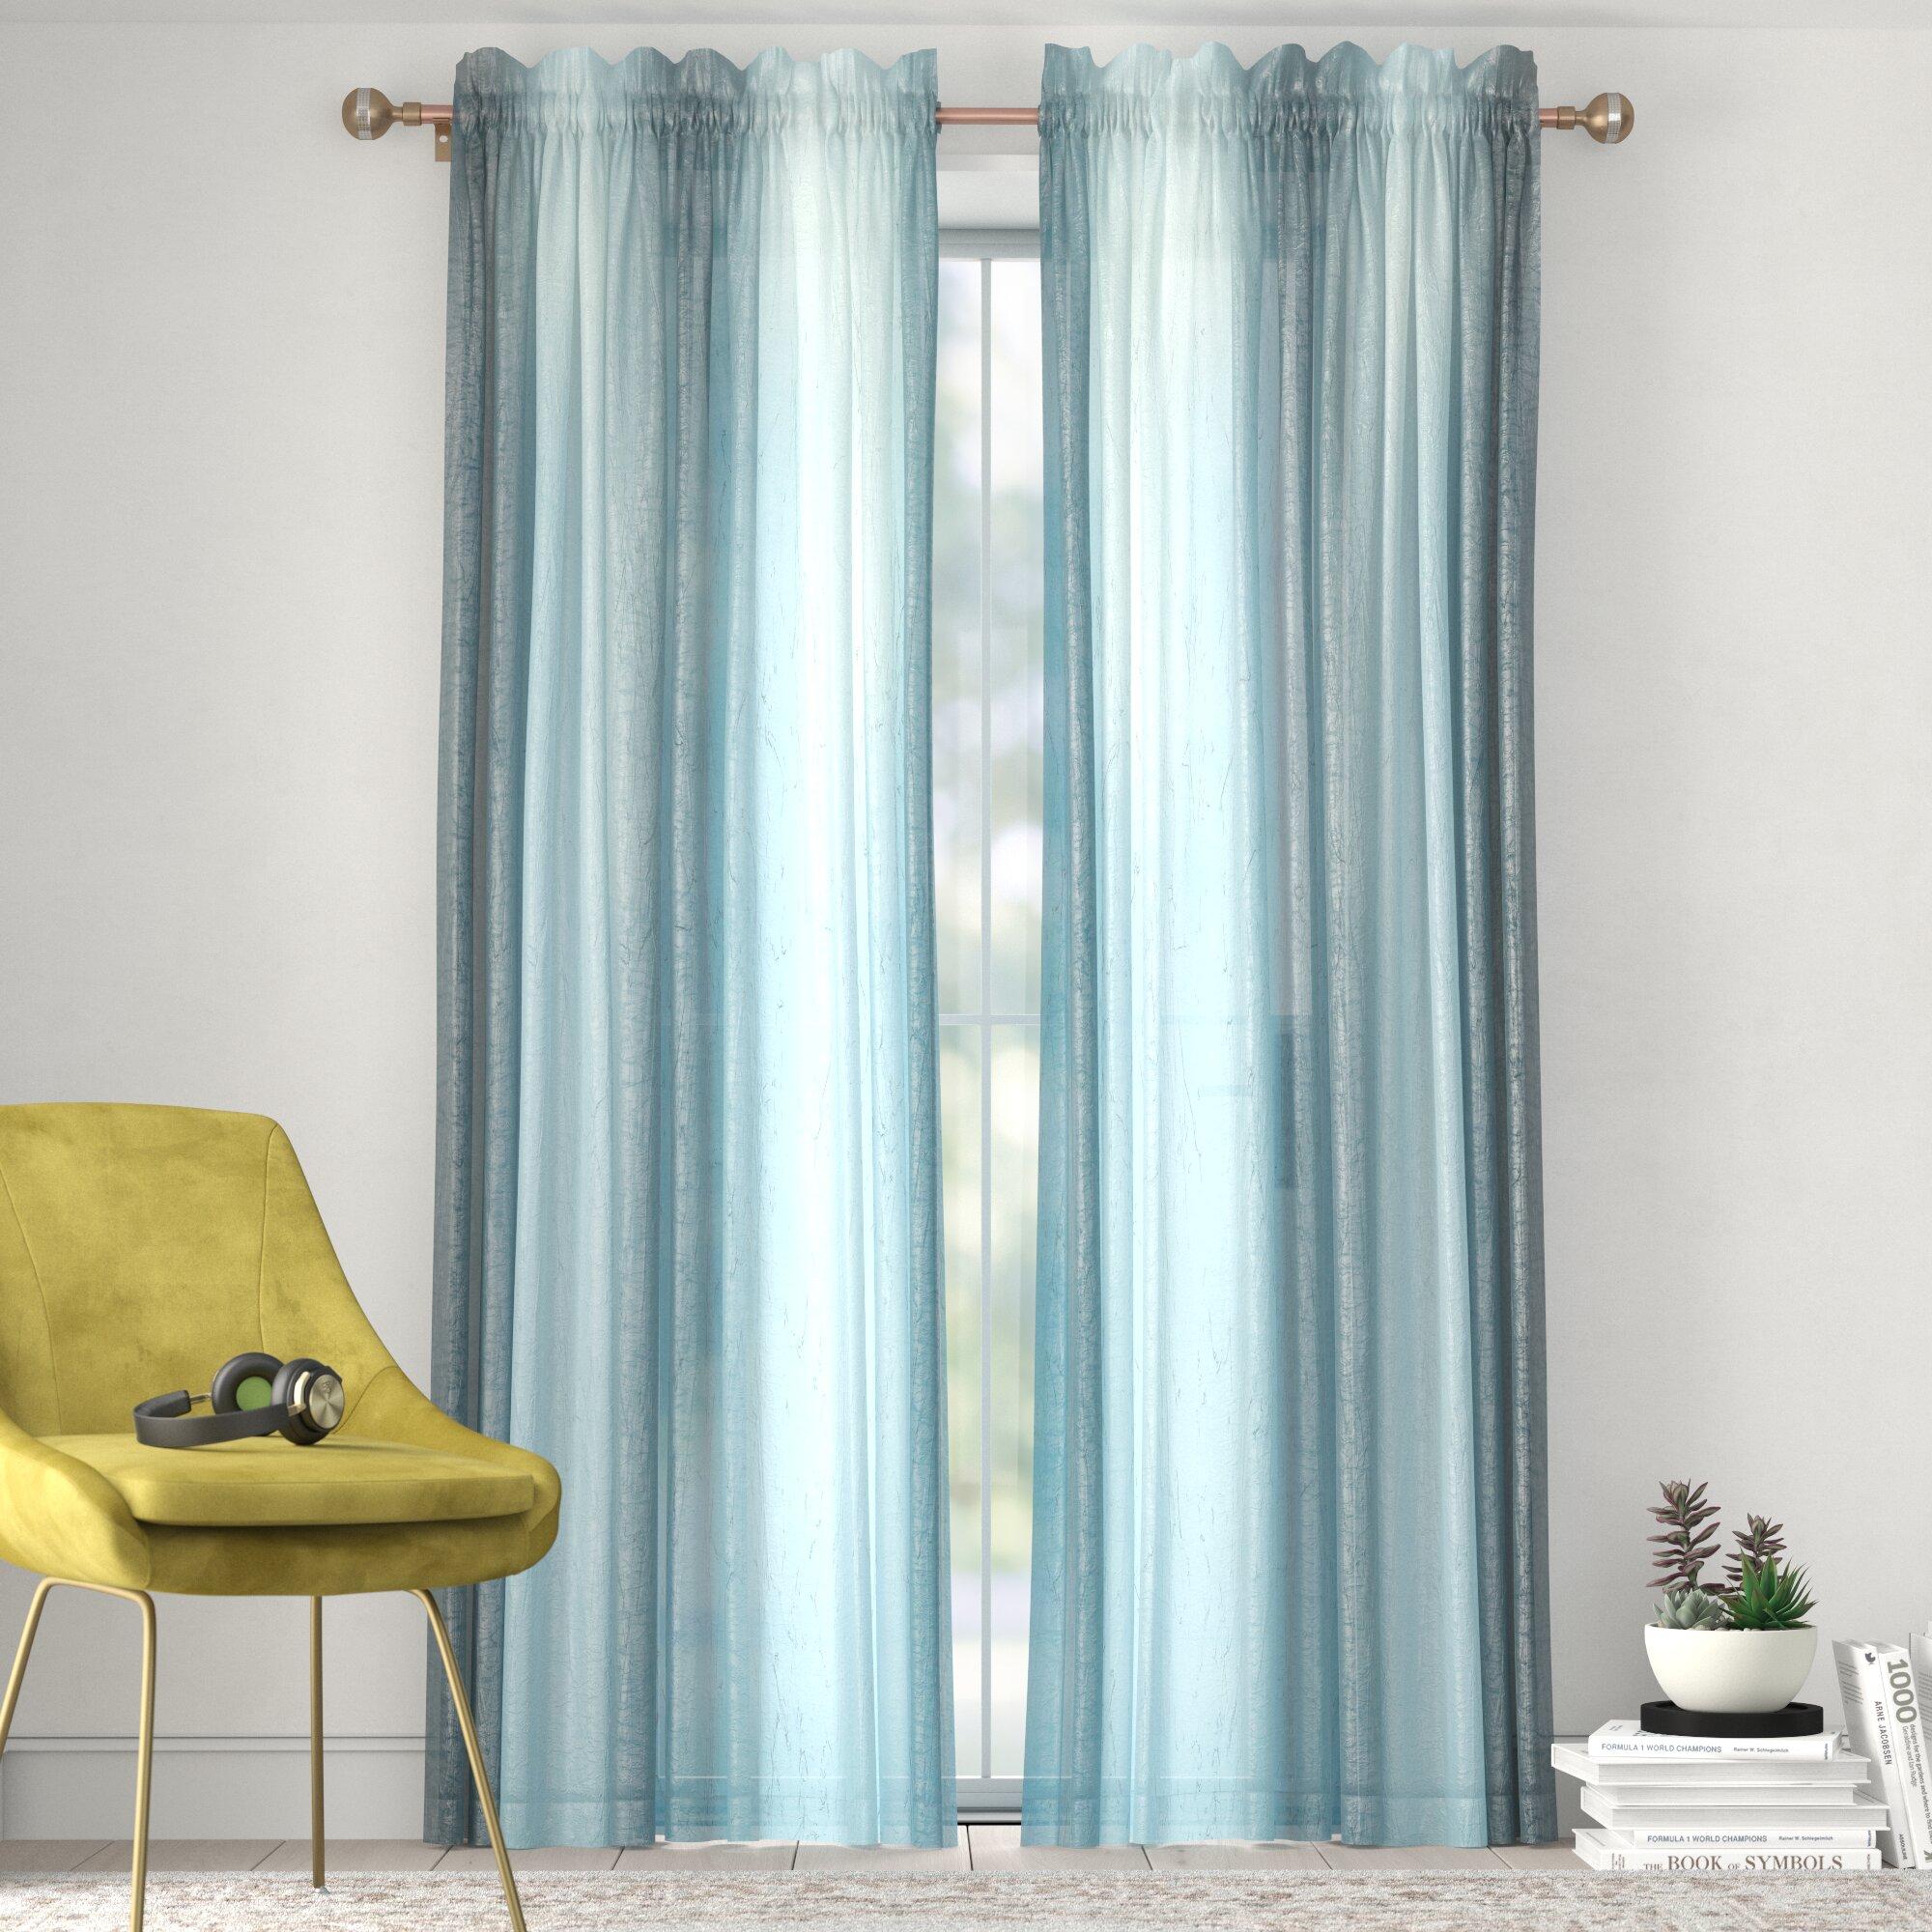 Window Curtain Panel Rainbow Multi-Color Pink//Orange Semi-Sheer Light Filtering